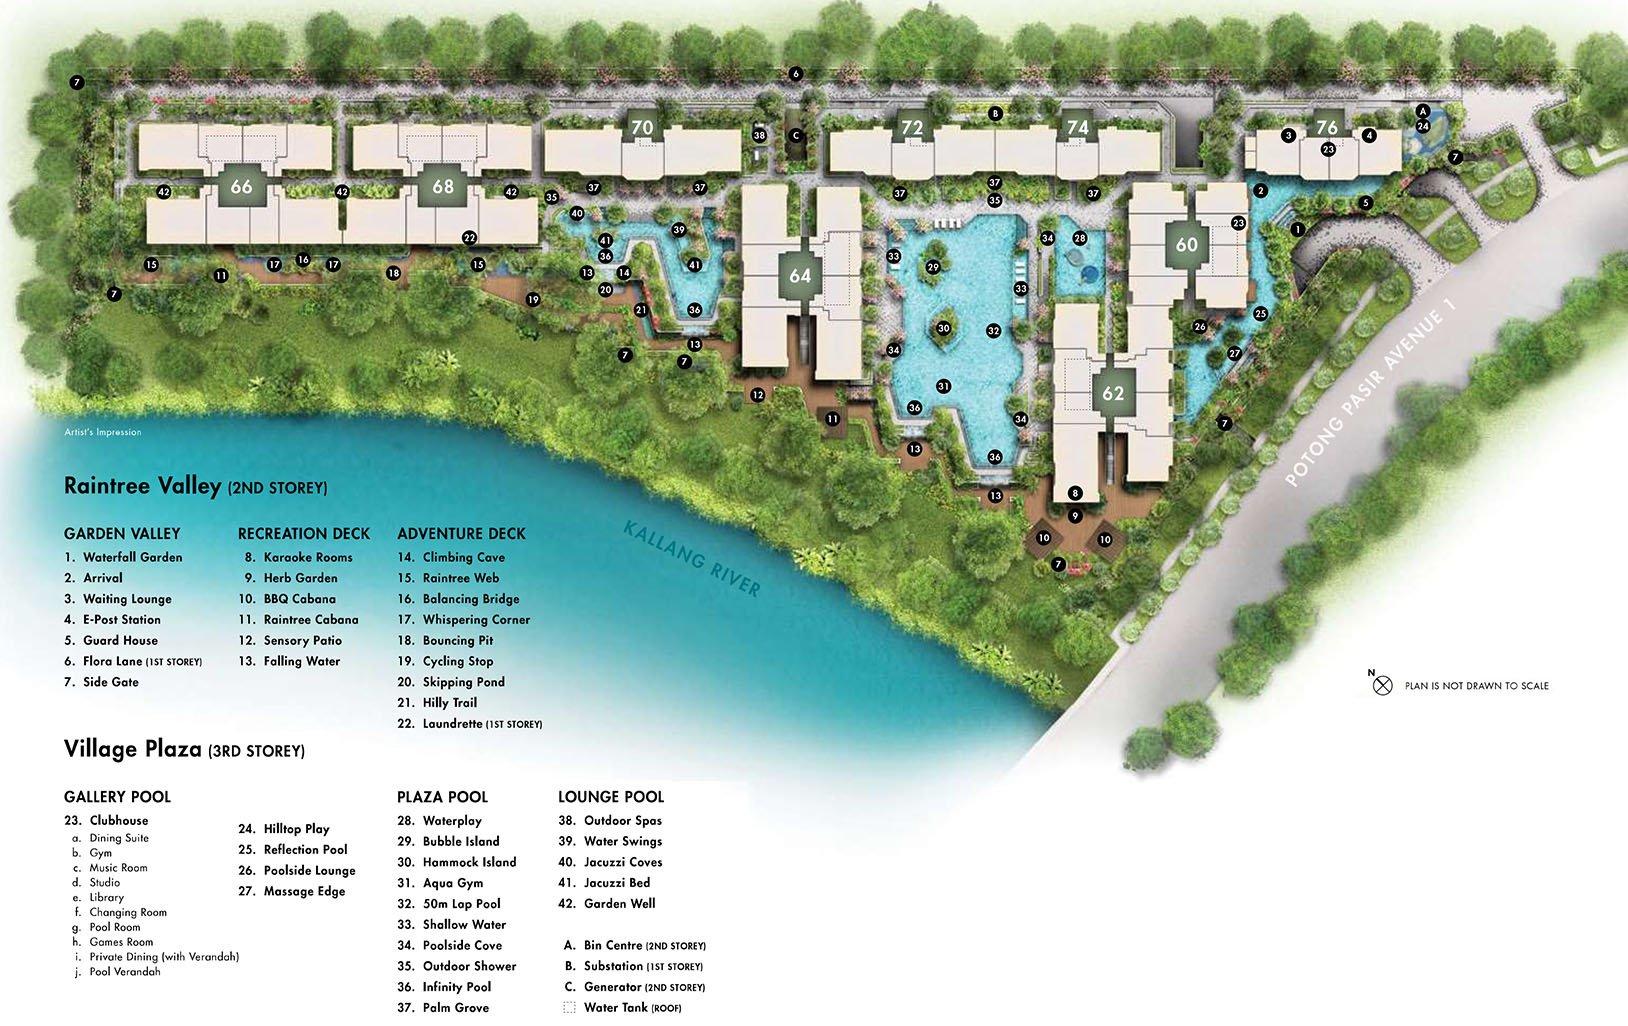 The Tre Ver Facilities Site Plan